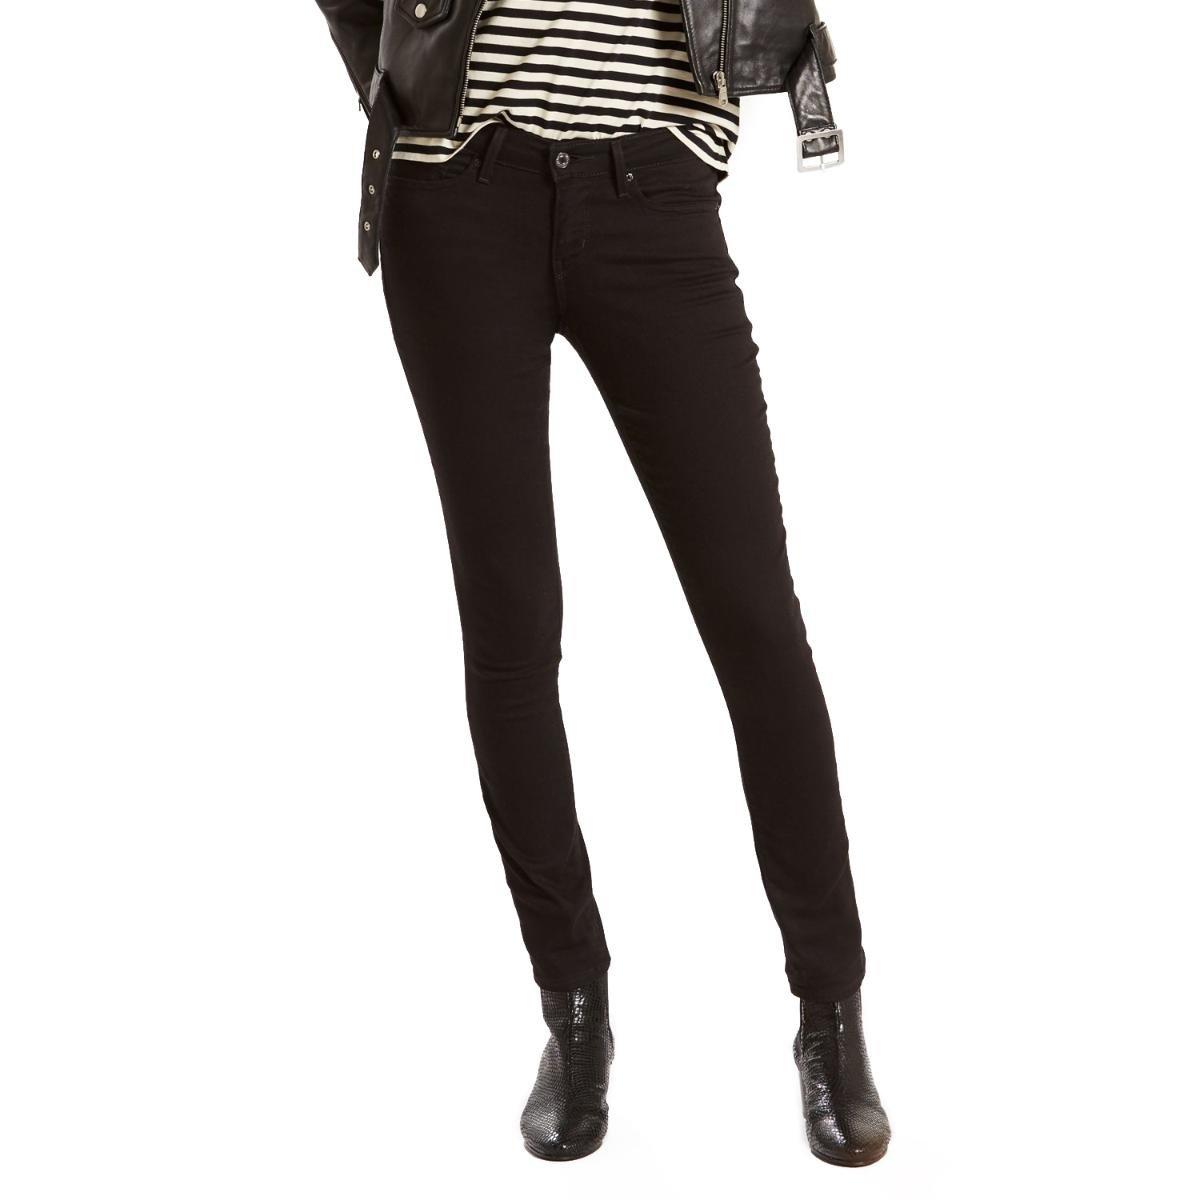 Calça Jeans Levis 711 Skinny Feminina - Preto - Compre Agora  22aa18d6732